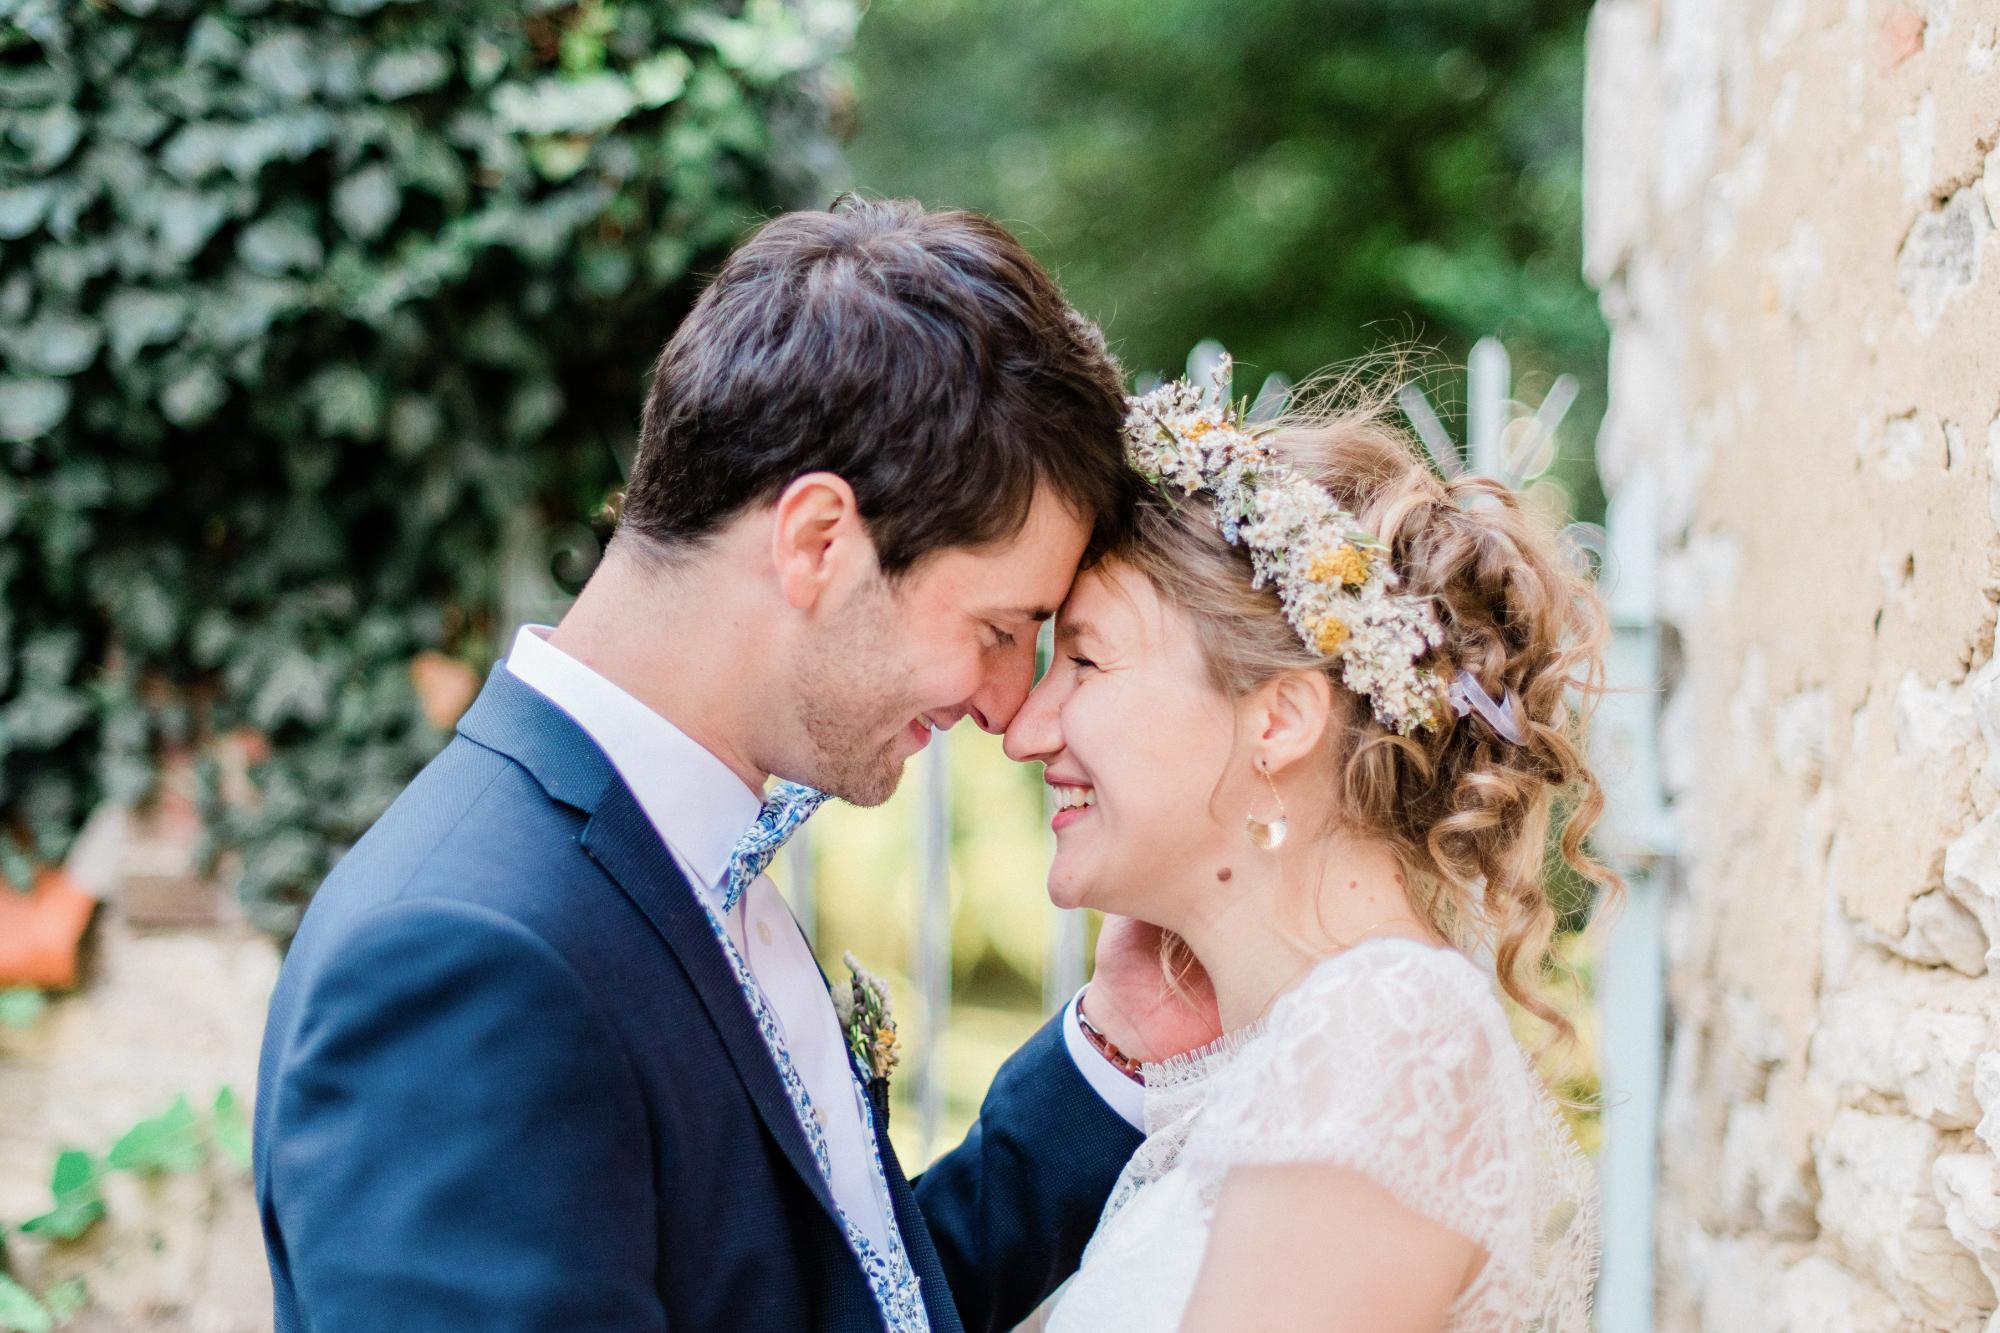 priscillapuzenat-photographe-mariage-domainedesgranges-poillysurtholon-yonne-bourgogne-france